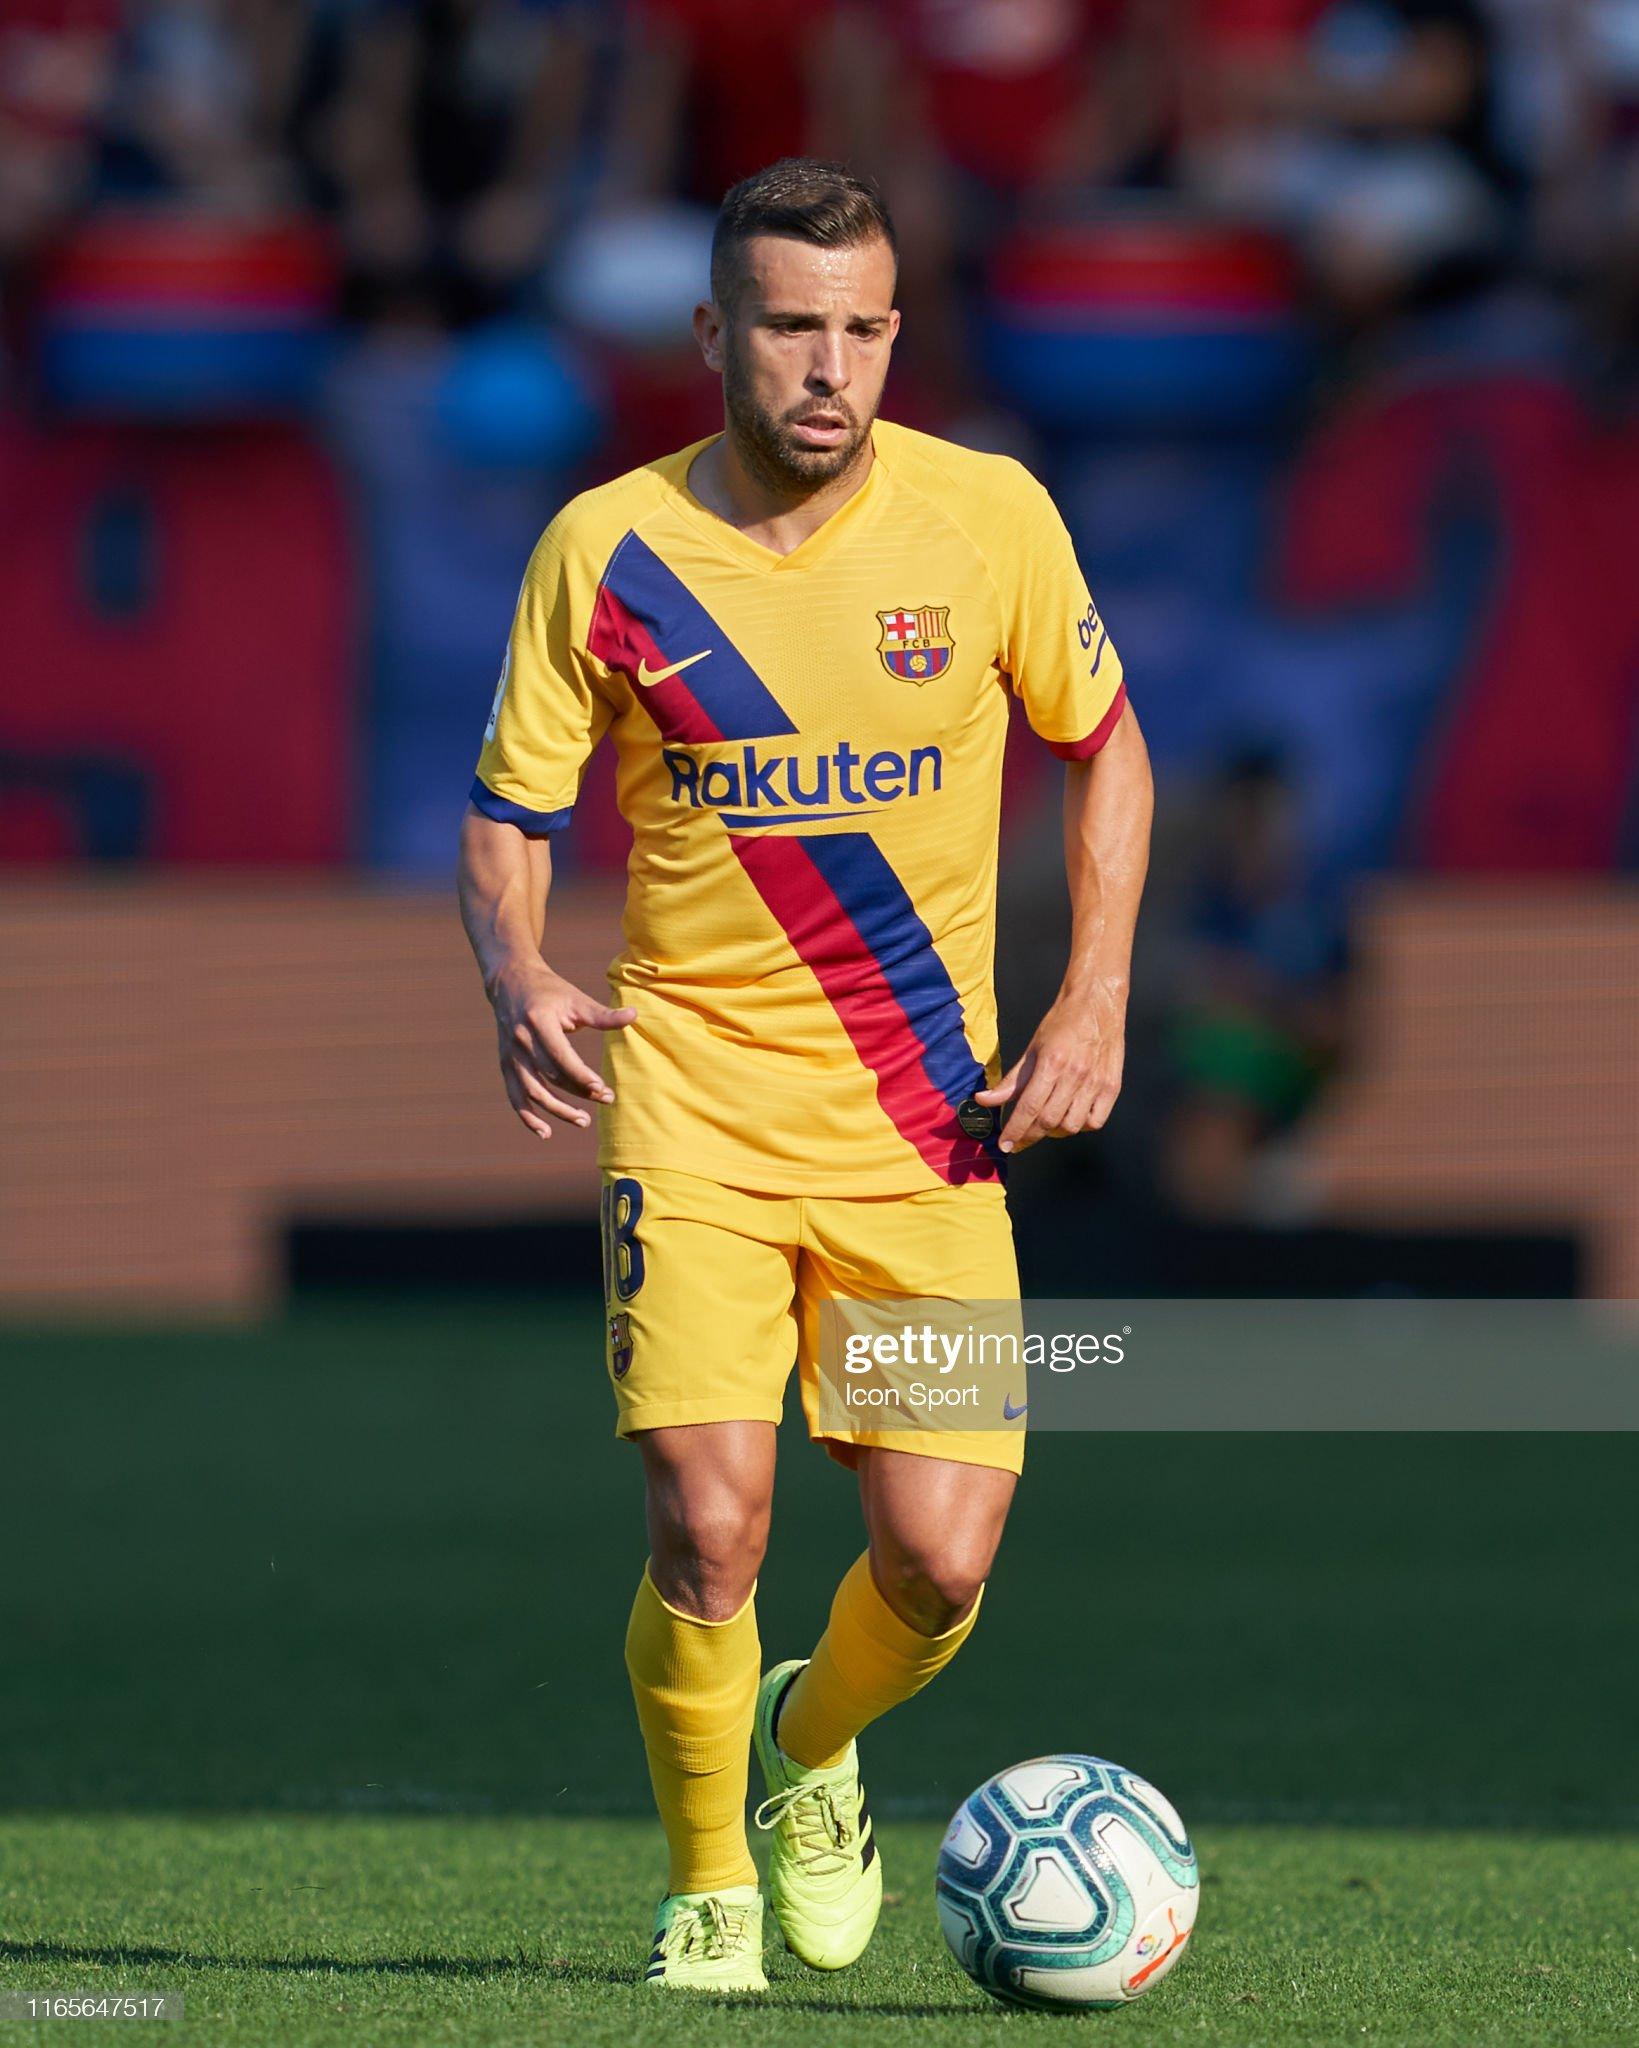 صور مباراة : أوساسونا - برشلونة 2-2 ( 31-08-2019 )  Jordi-alba-of-fc-barcelona-during-the-liga-match-between-osasuna-and-picture-id1165647517?s=2048x2048